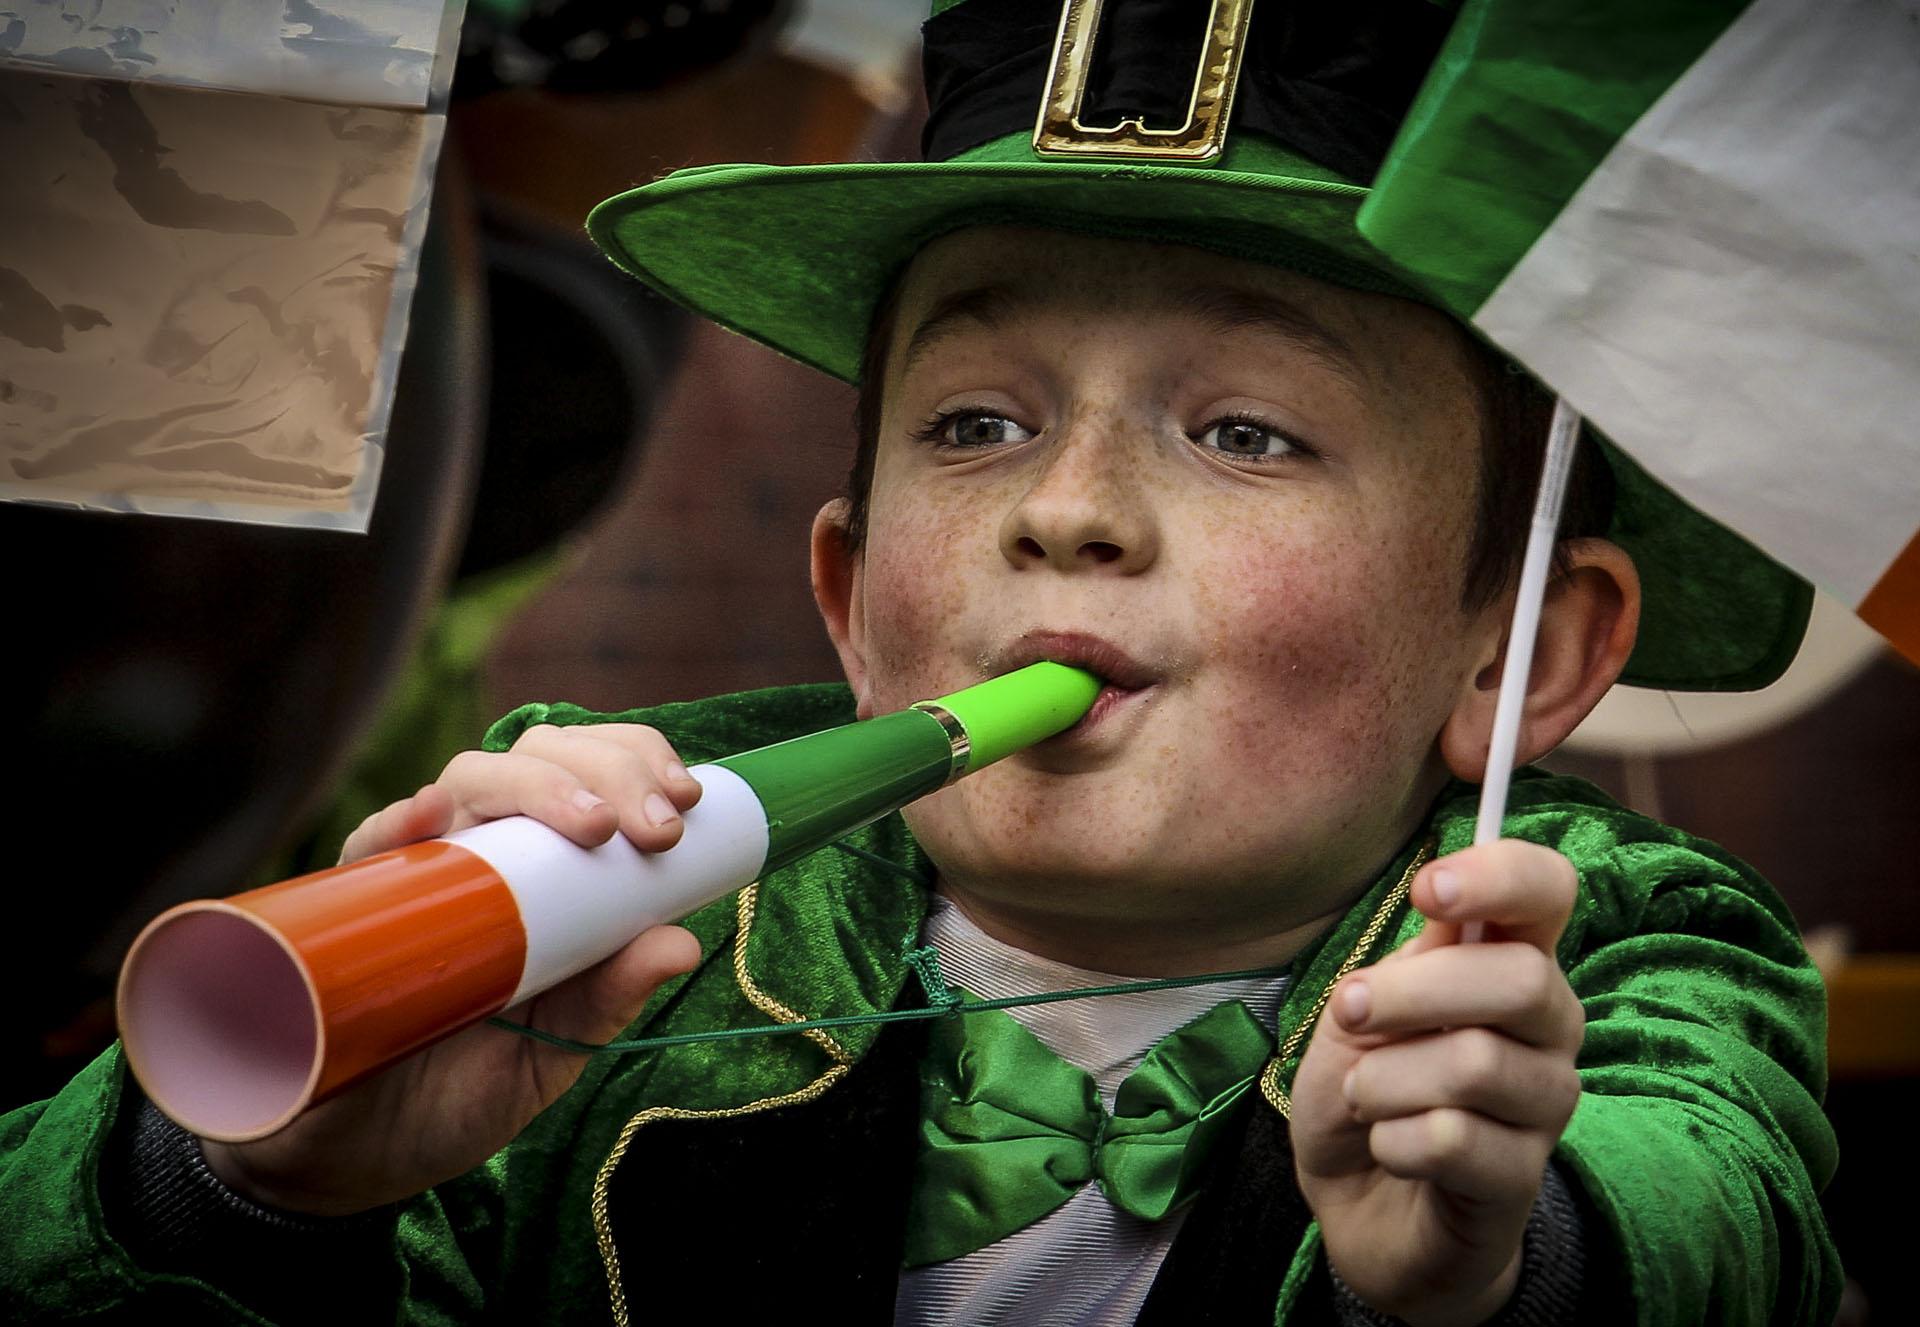 Paddy's Vuvuzela